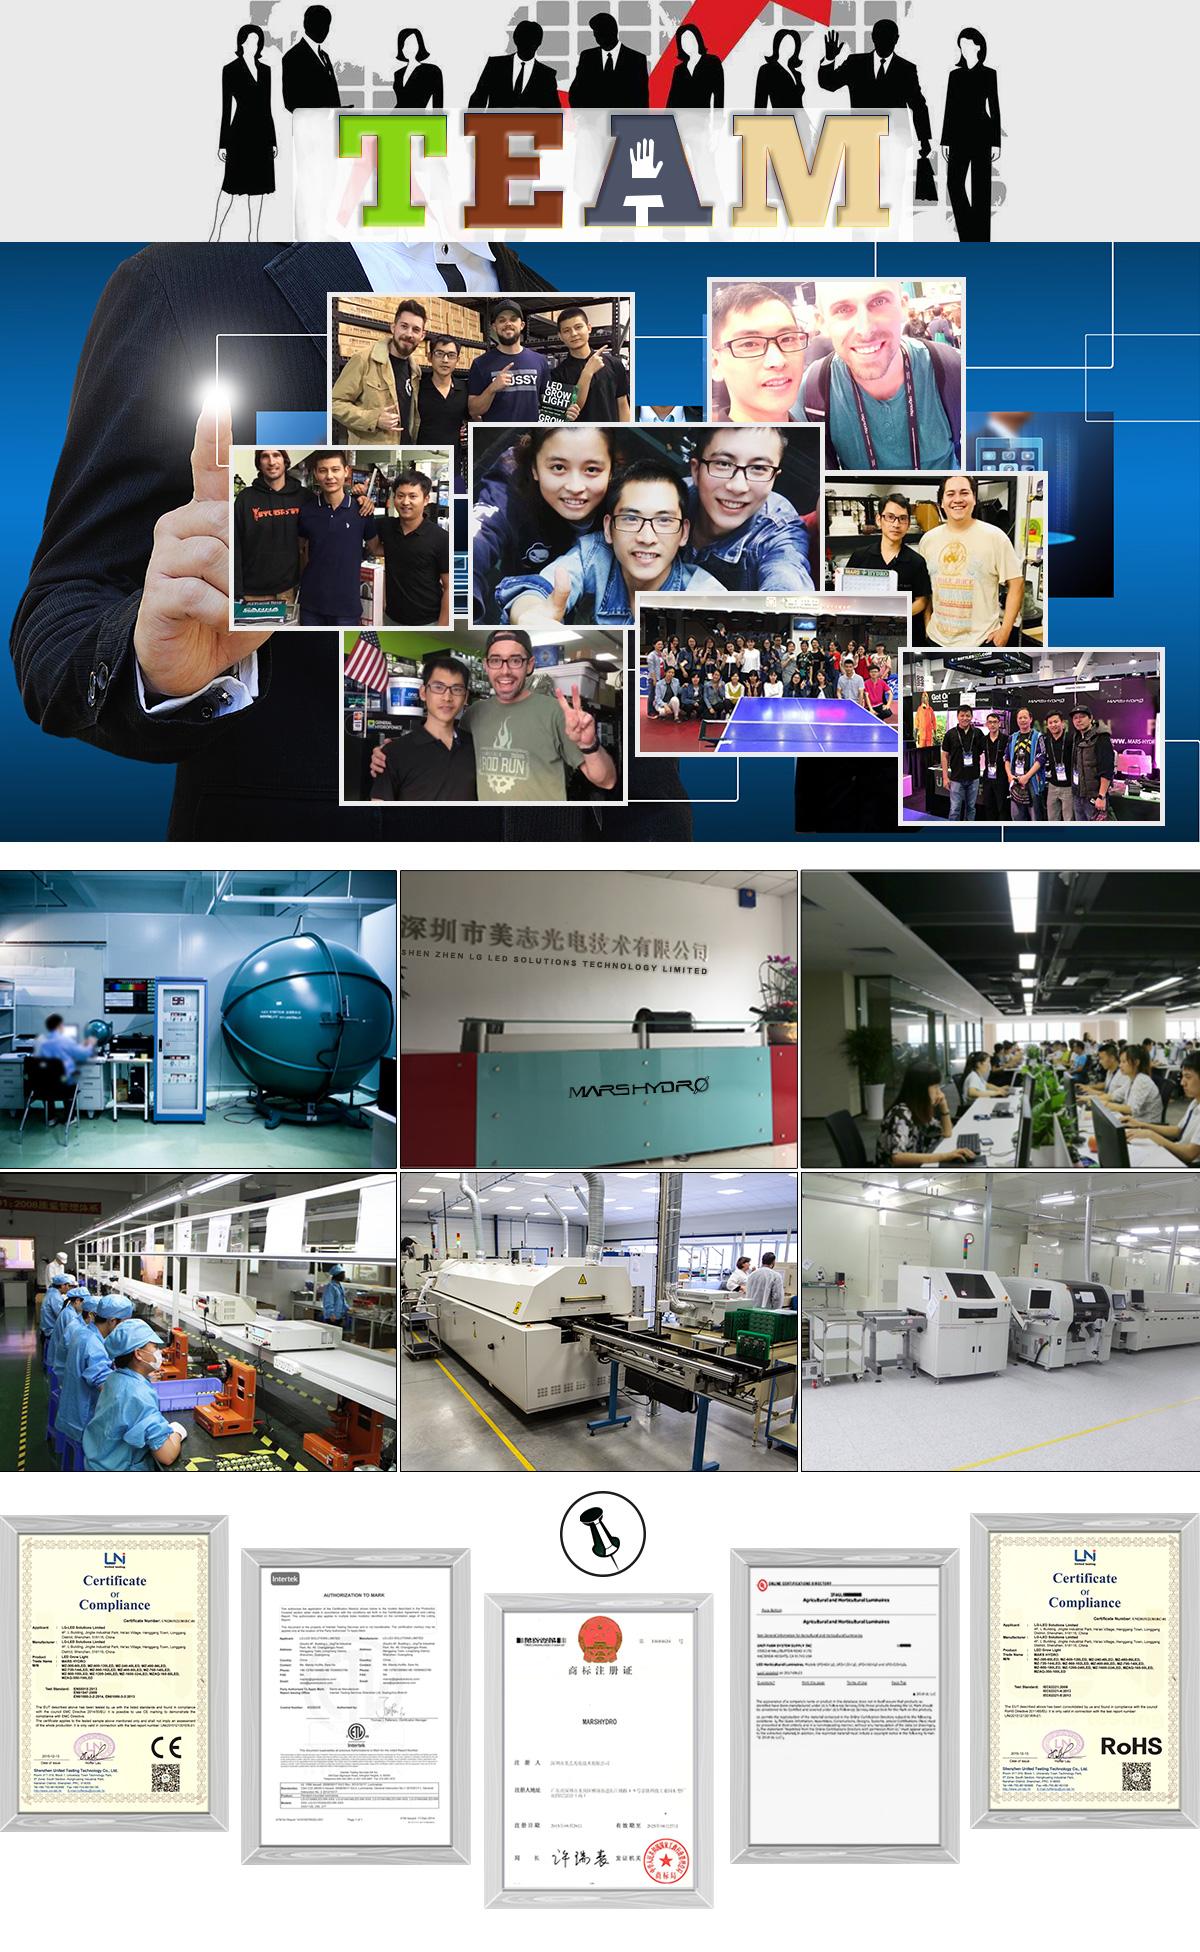 Best seller Most Cost 효과적인 풀 스펙트럼 400 와트 900 와트 1600 와트 led grow 빛 HID/MH 800 와트 projektor의